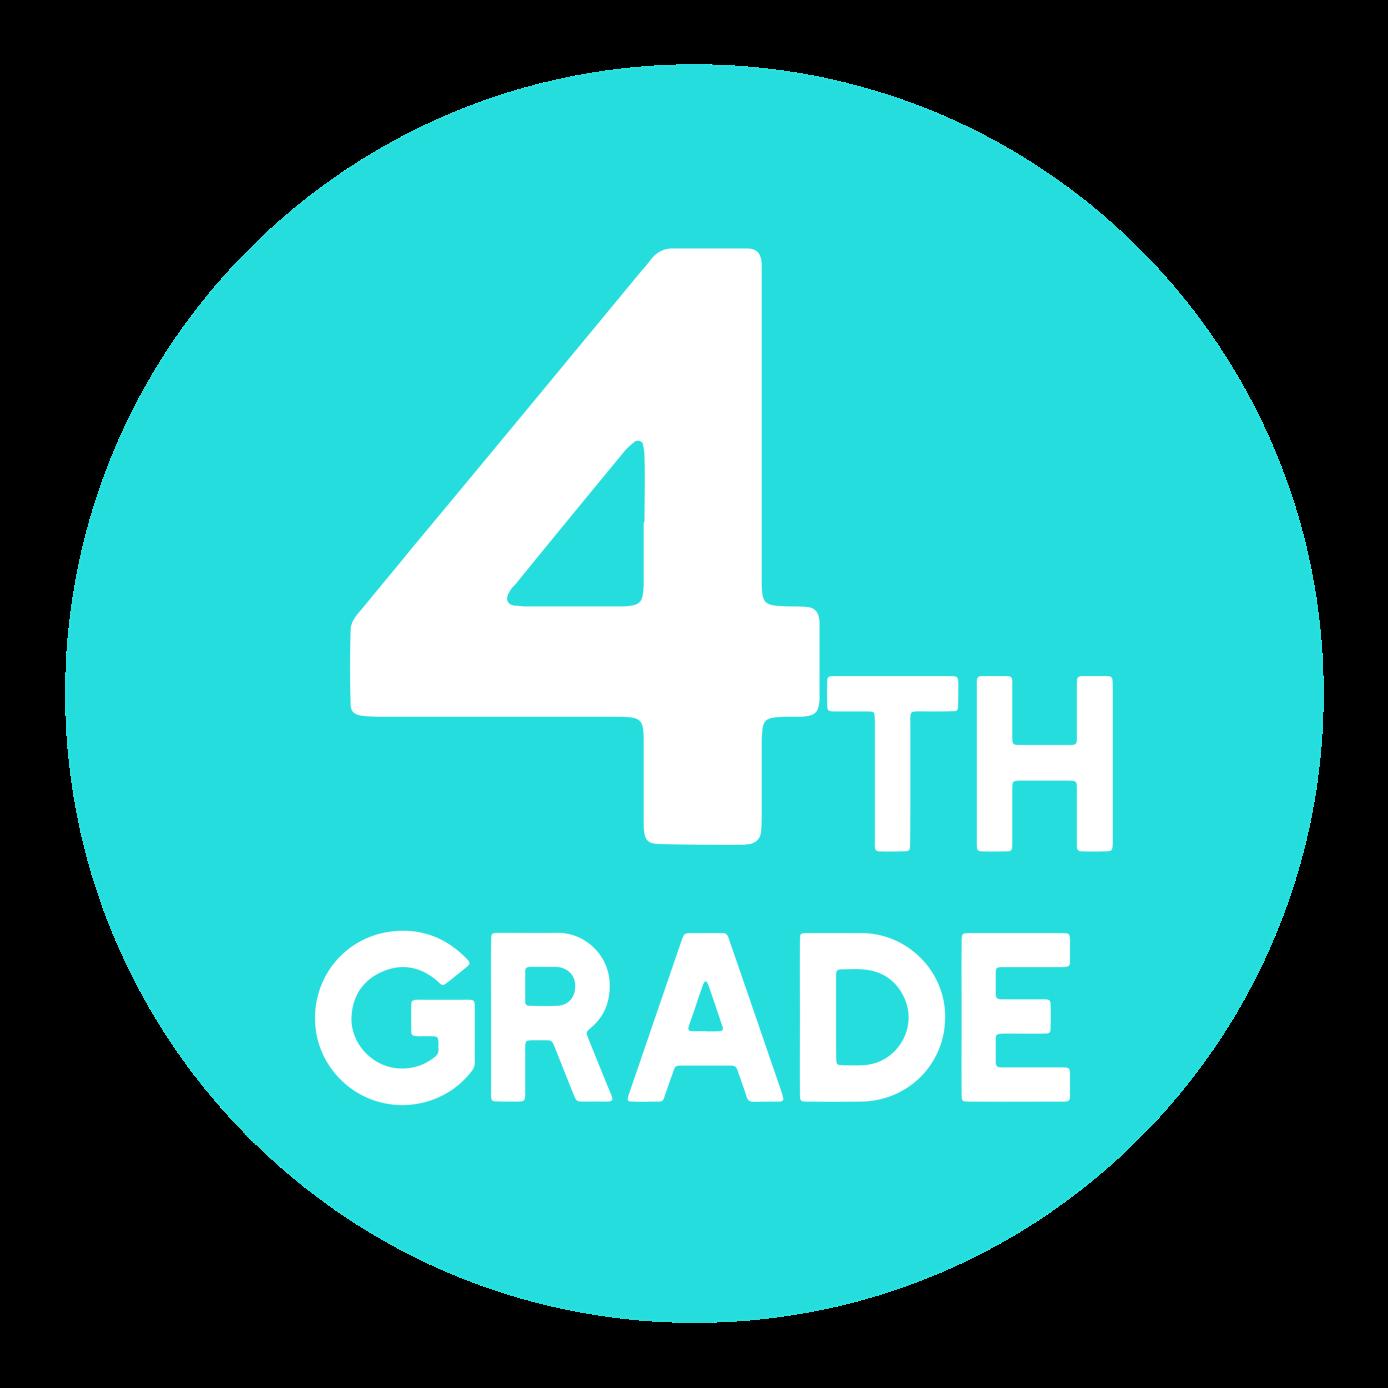 Free 4th Grade Math Worksheets — Mashup Math Free Th Grade Math Worksheets Long Division on